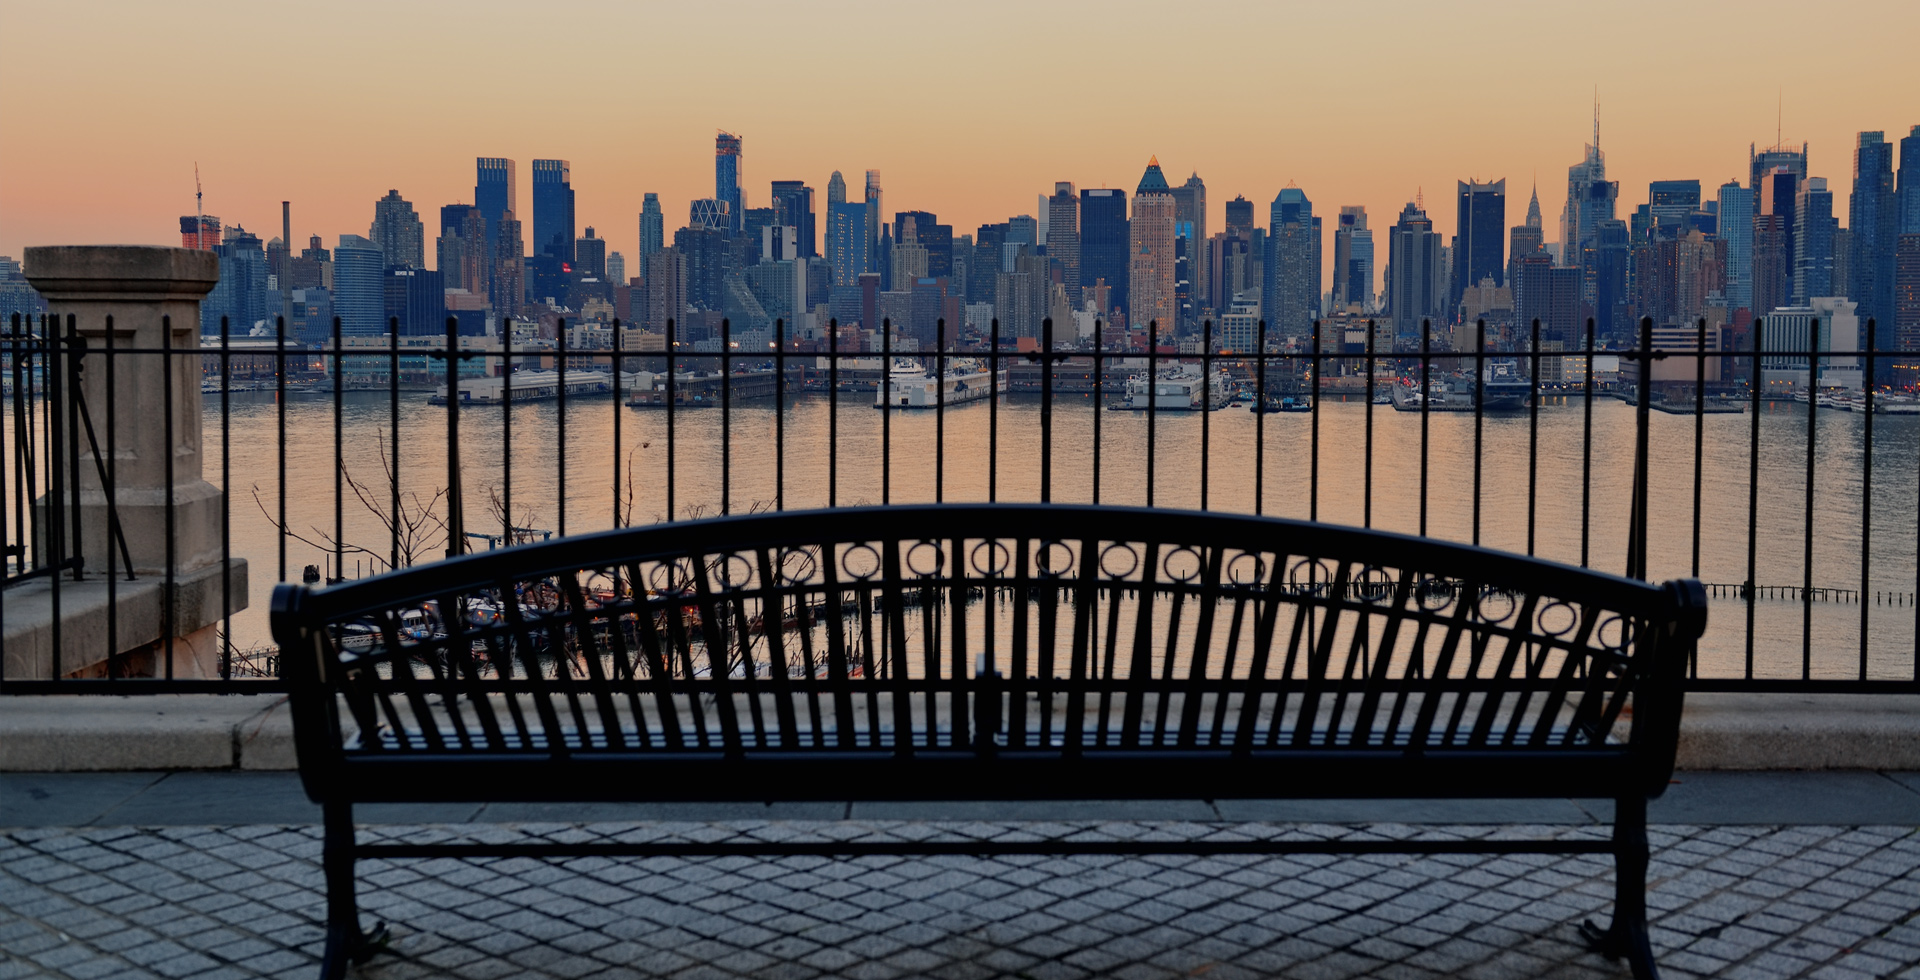 Bench Overlooking New York City